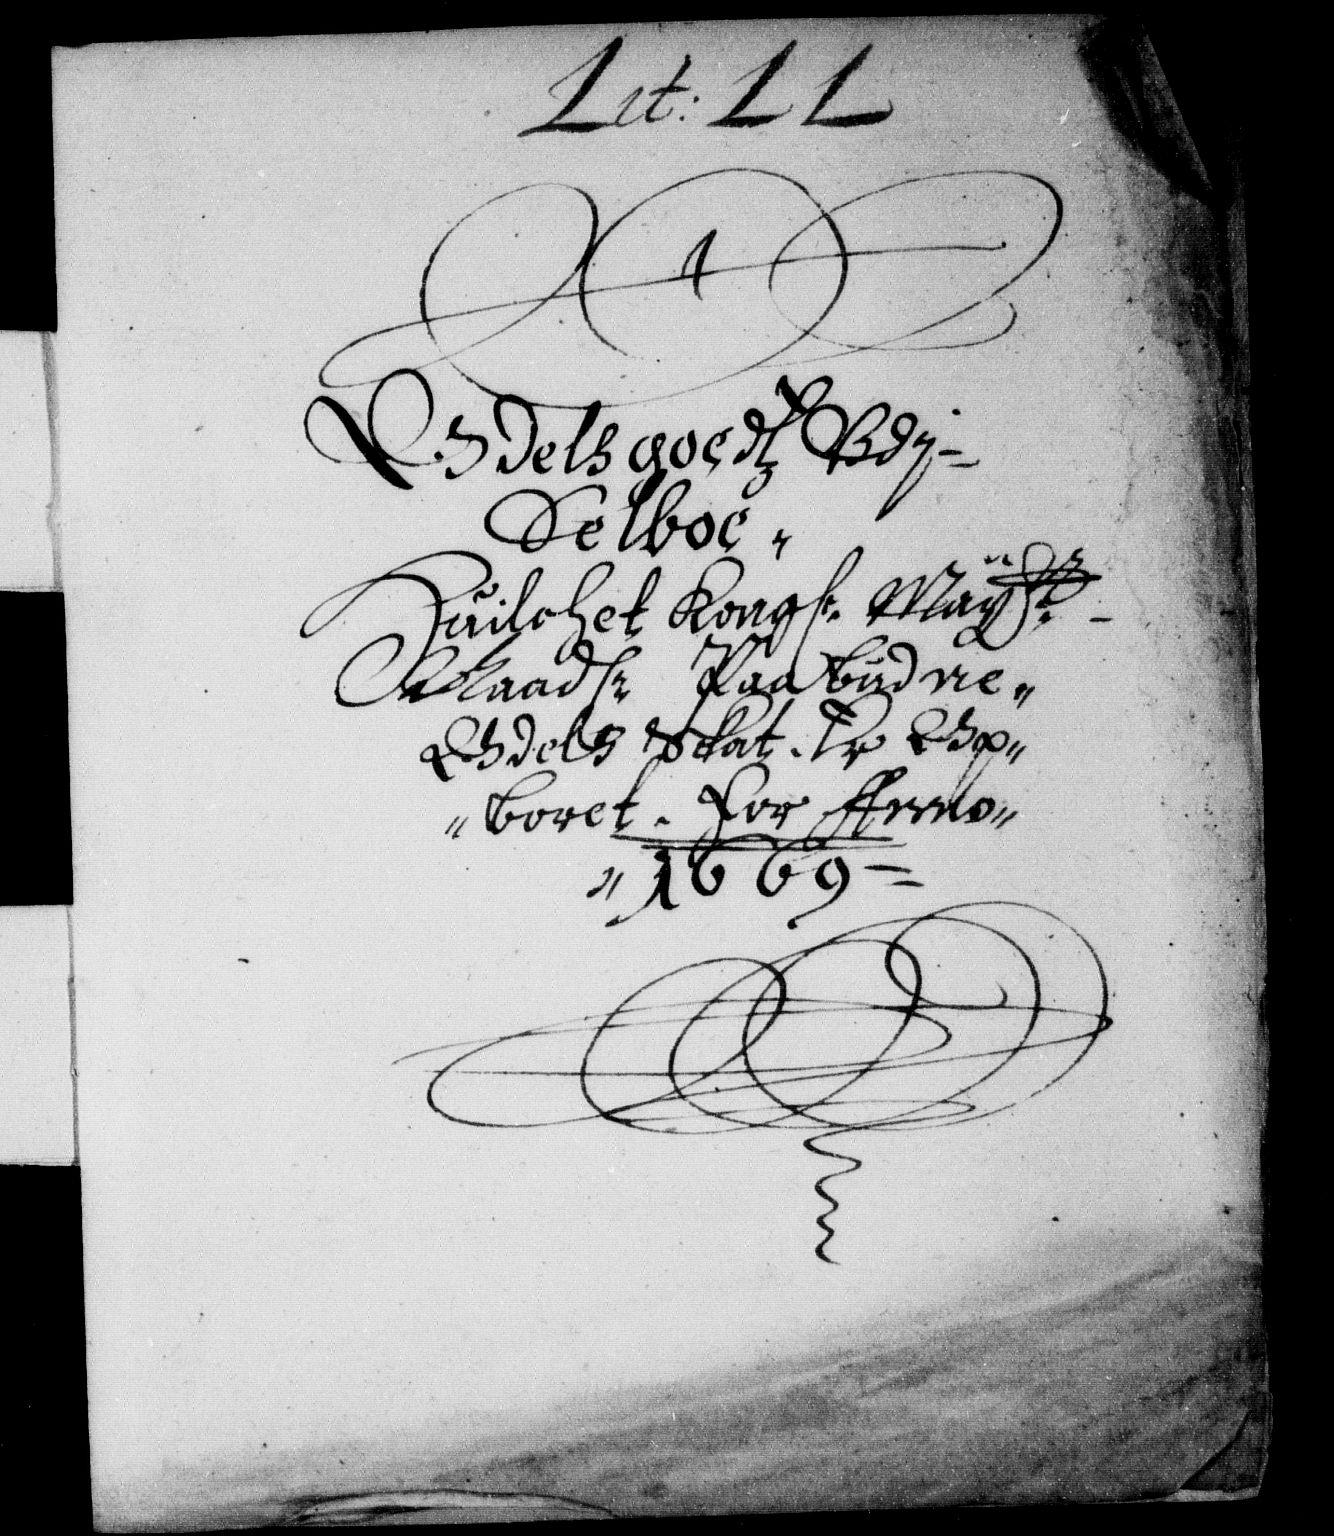 RA, Rentekammeret inntil 1814, Reviderte regnskaper, Stiftamtstueregnskaper, Trondheim stiftamt og Nordland amt, R/Rd/L0027: Trondheim stiftamt, 1669